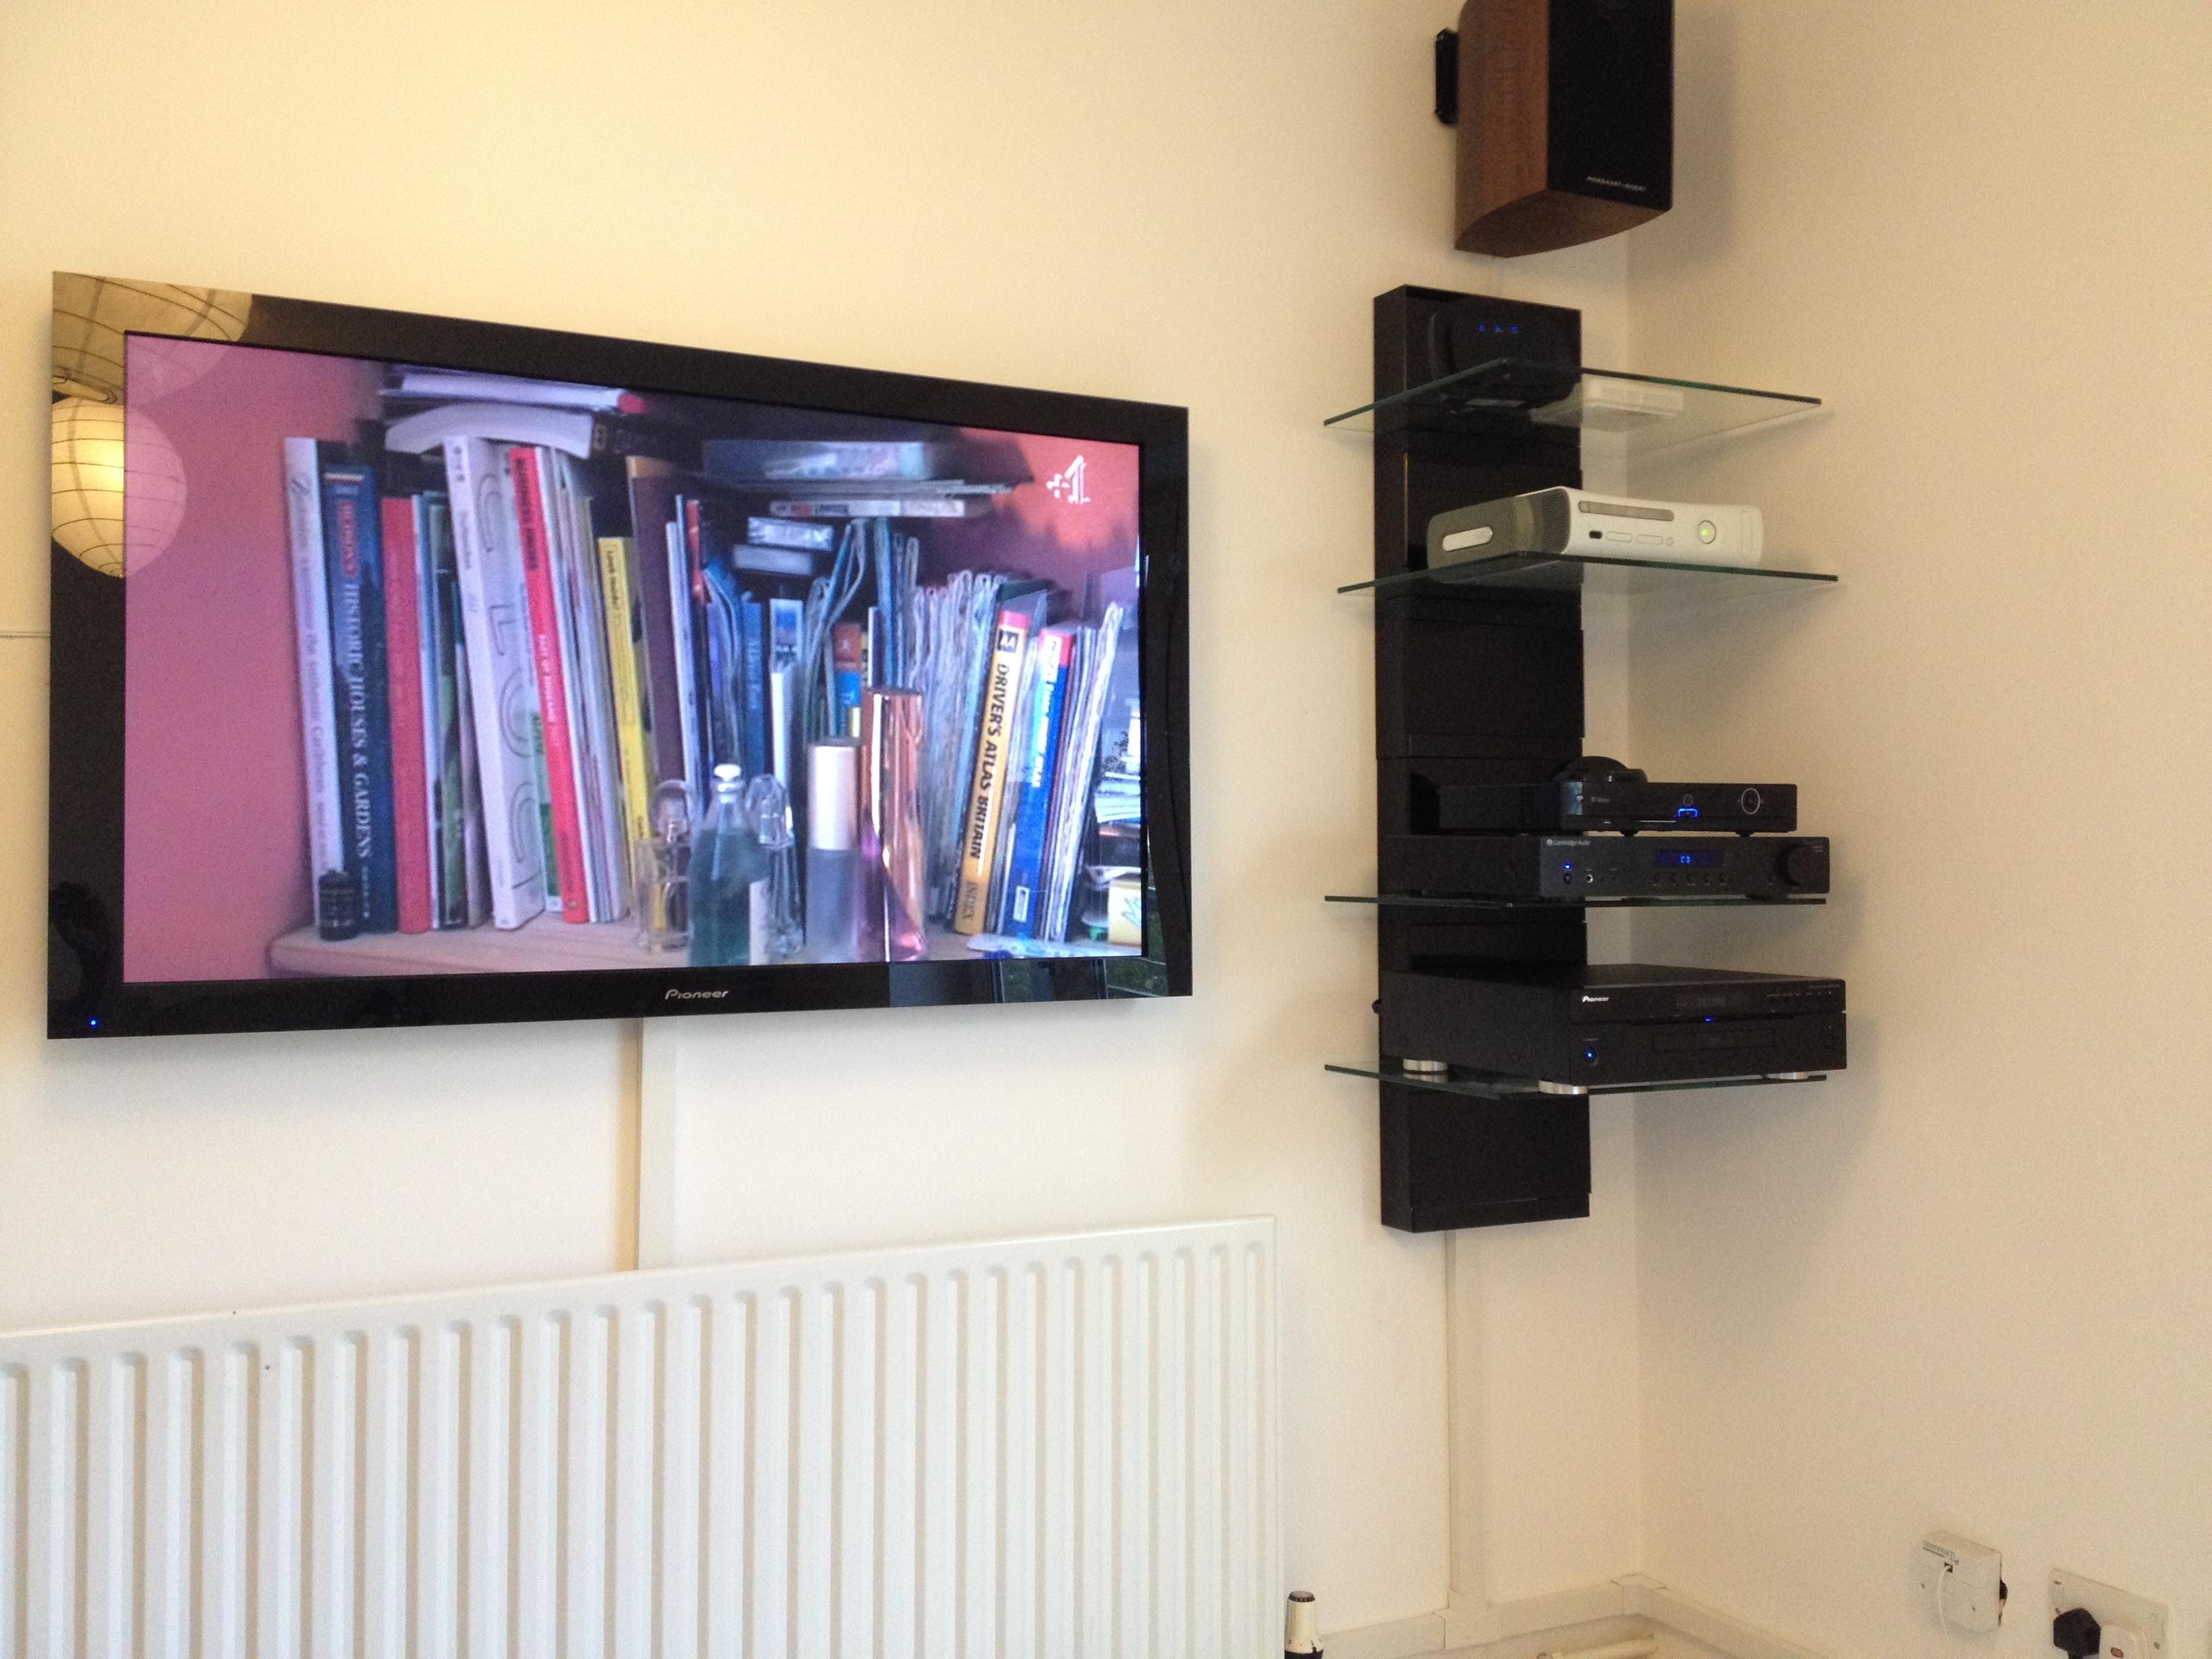 Pioneer plasma TV installation in London